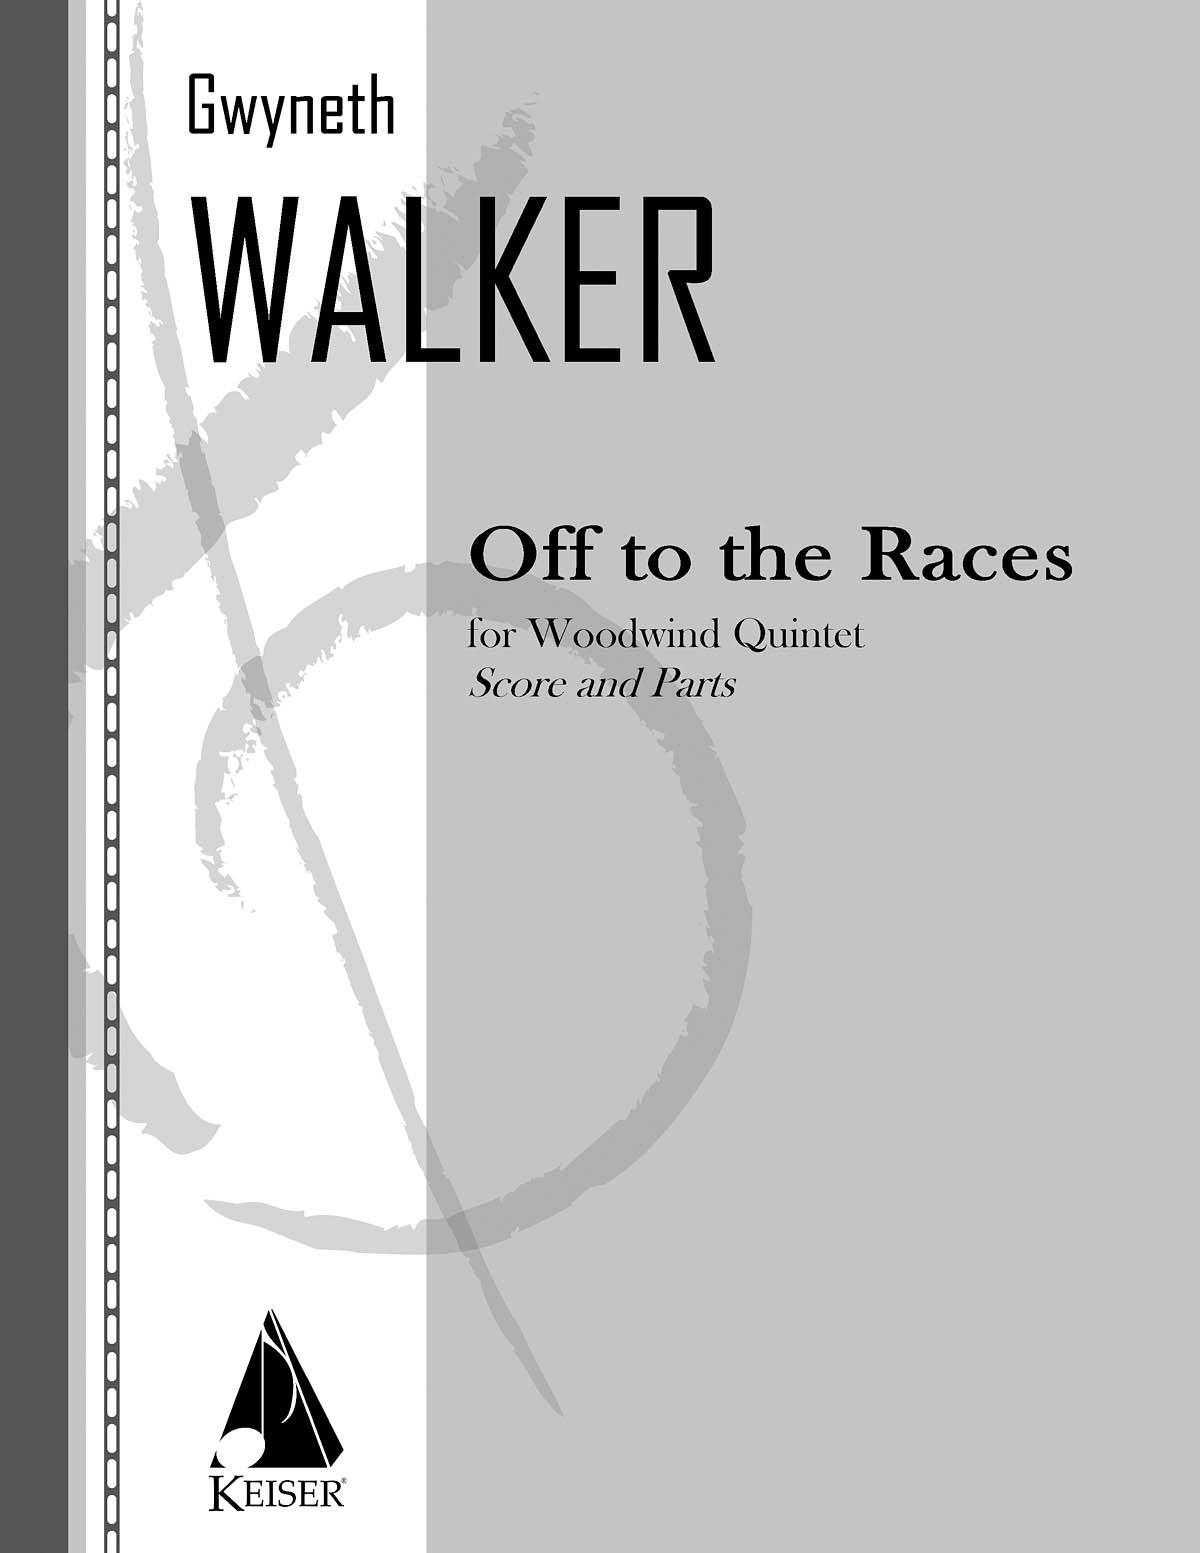 Gwyneth Walker: Off to the Races for Woodwind Quintet: Woodwind Ensemble: Score